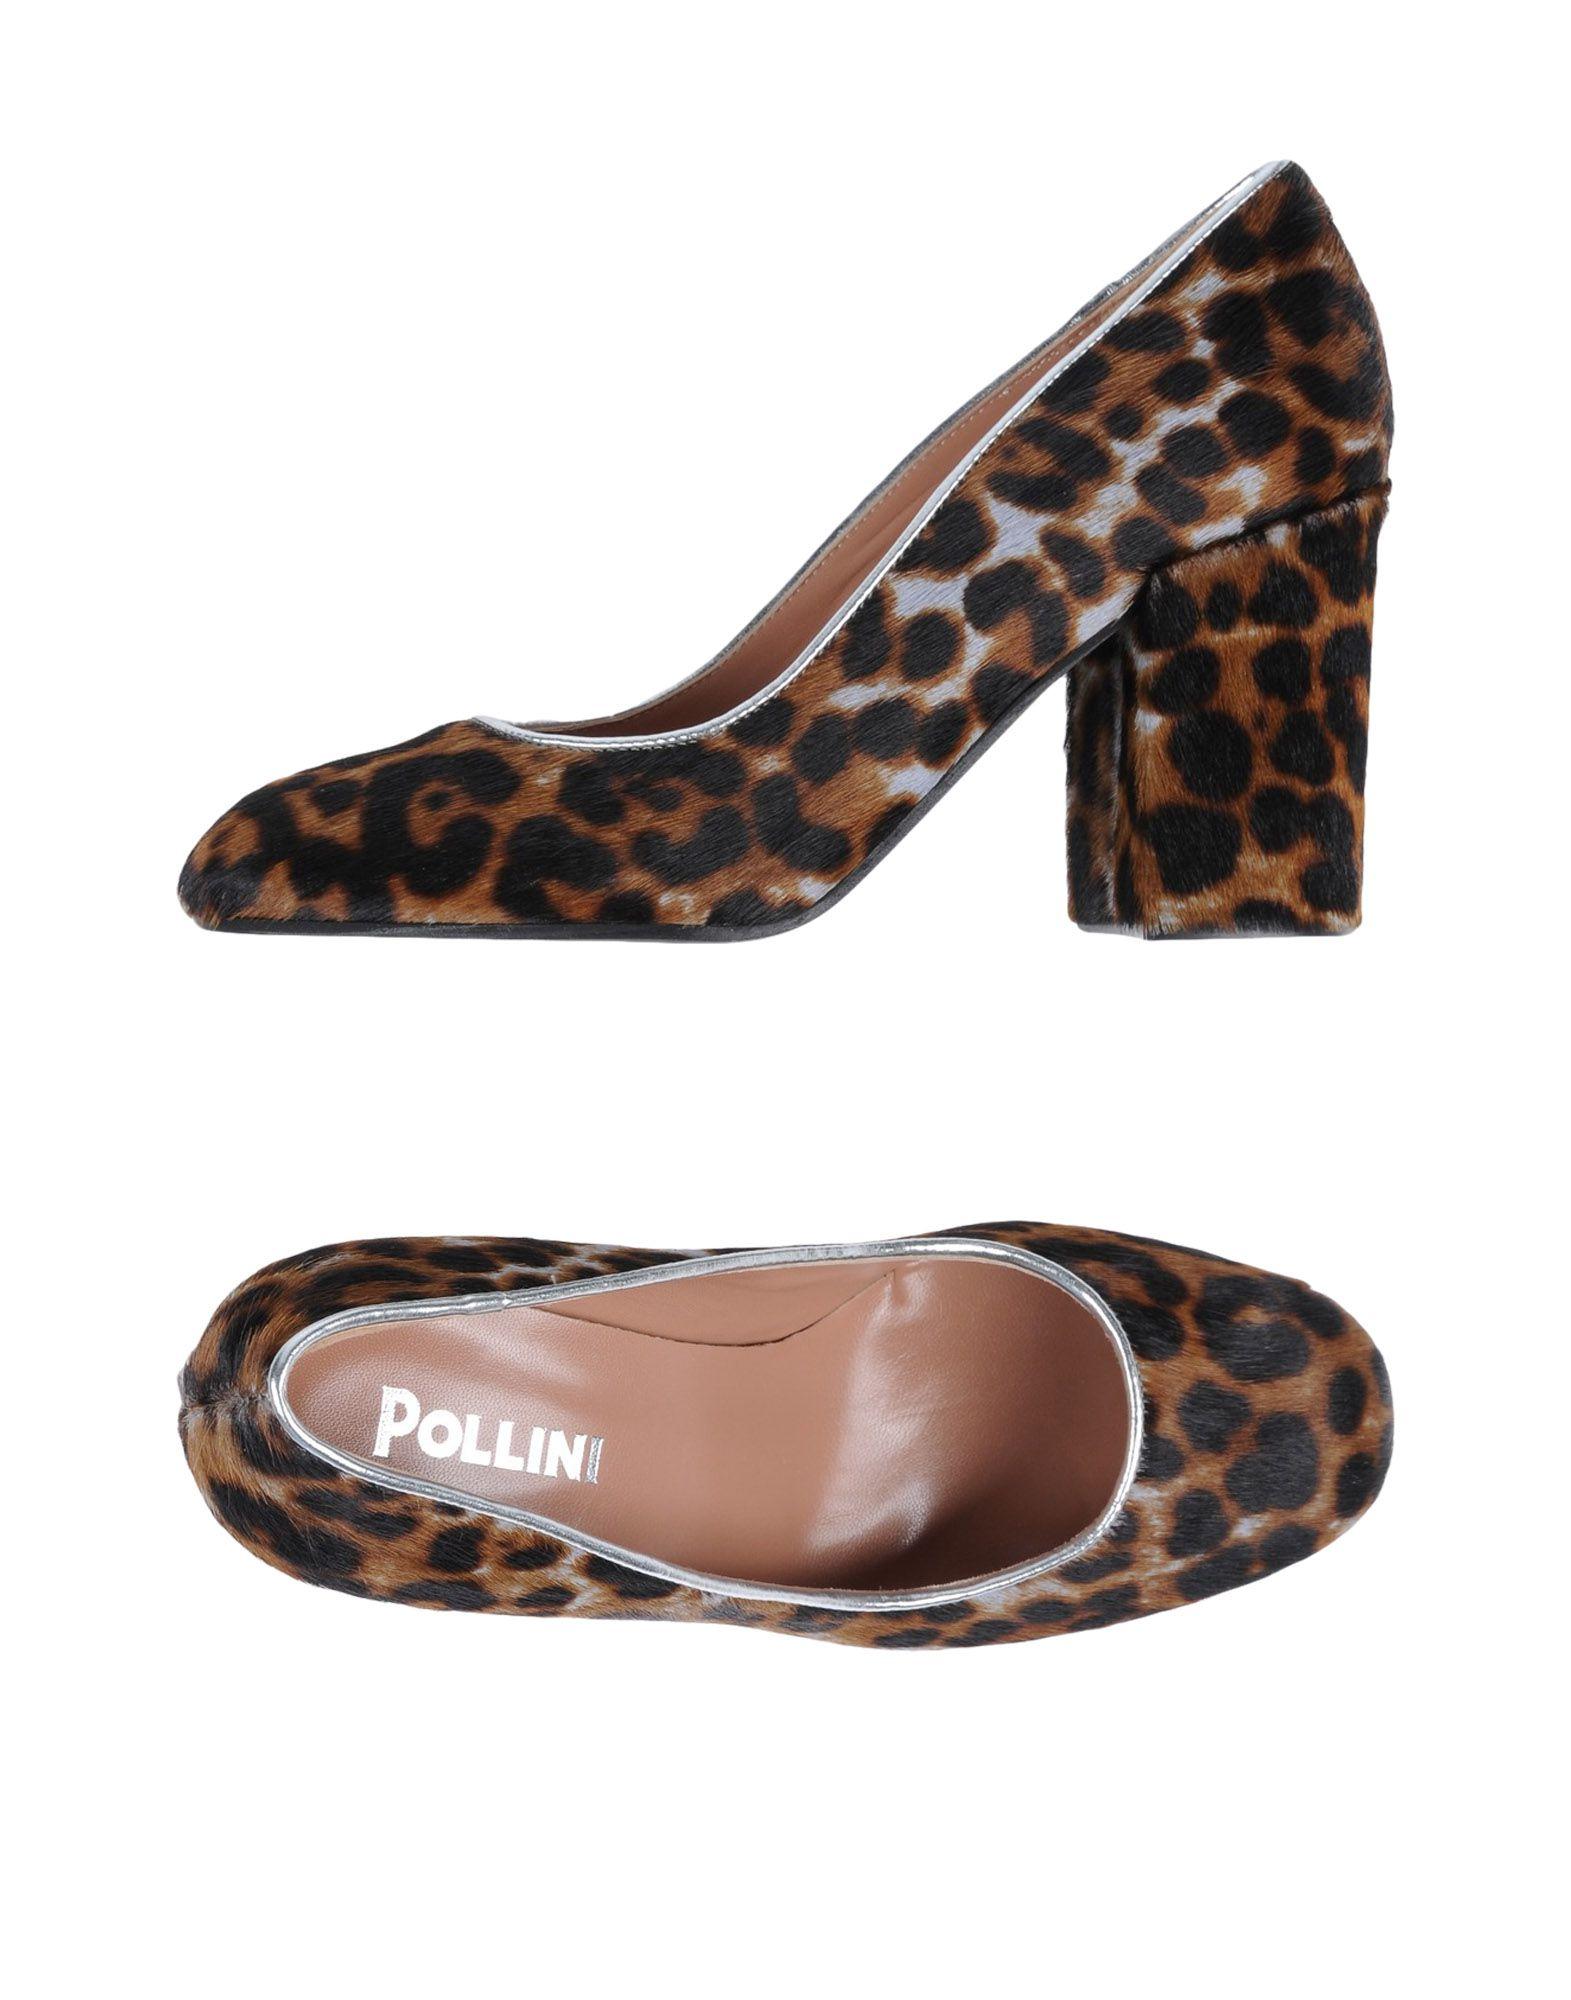 Moda Moda Moda Décolleté Pollini Donna - 11446891QC b25942